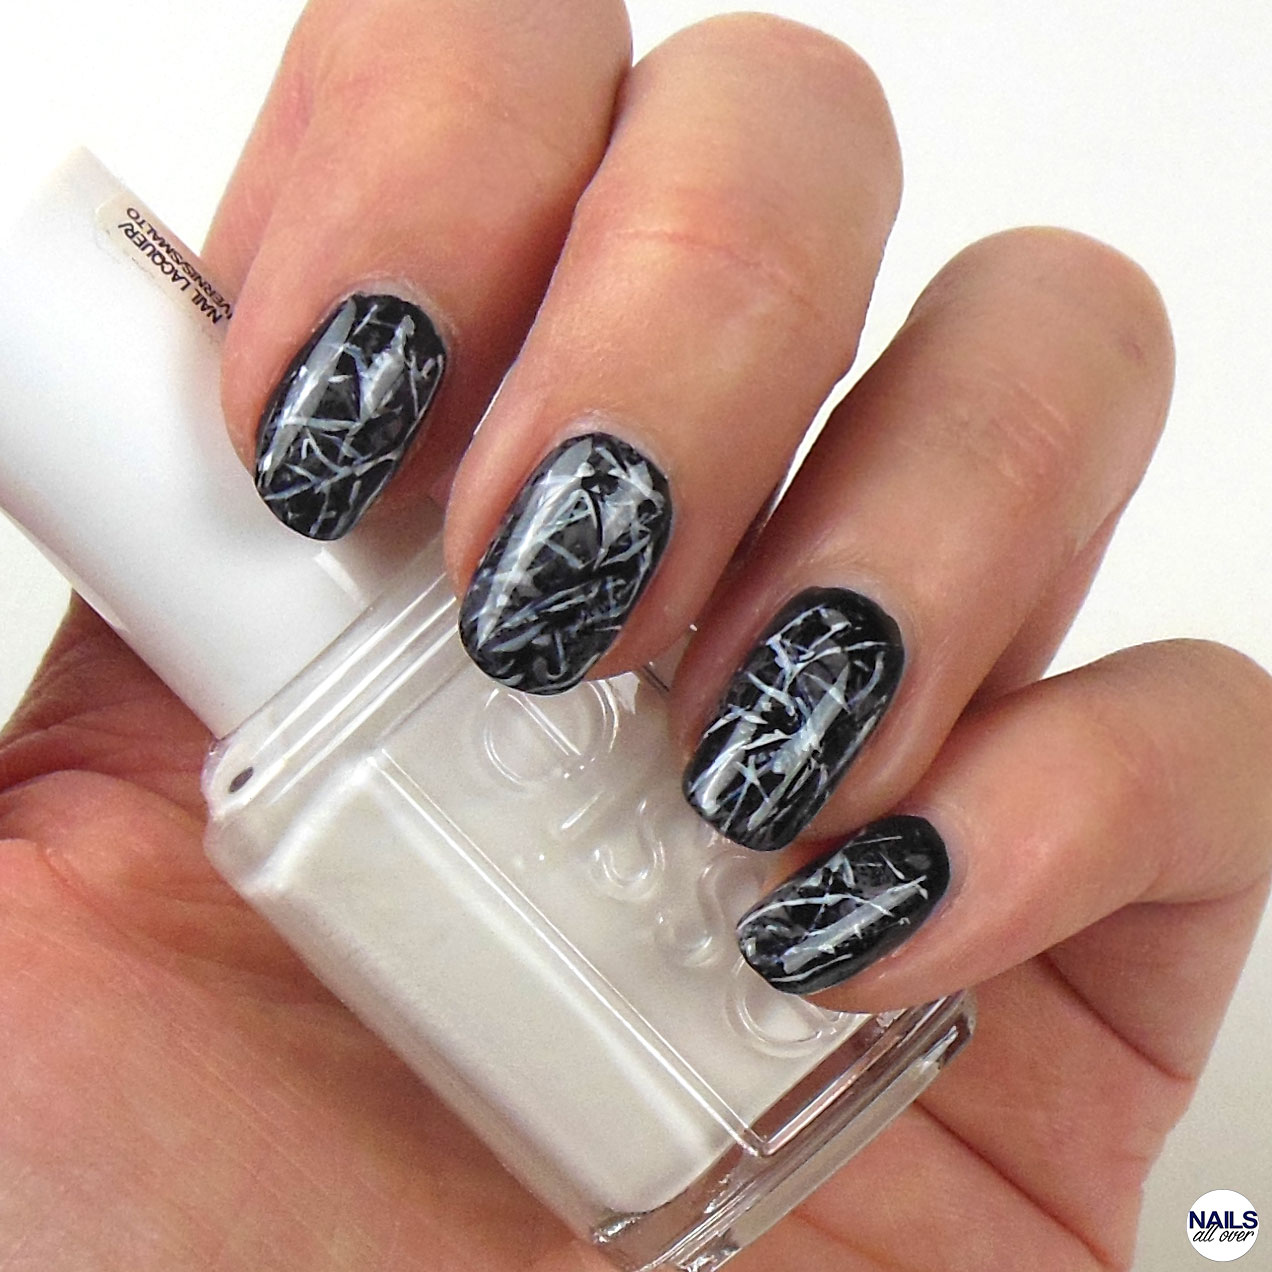 black marble nails nails all over. Black Bedroom Furniture Sets. Home Design Ideas